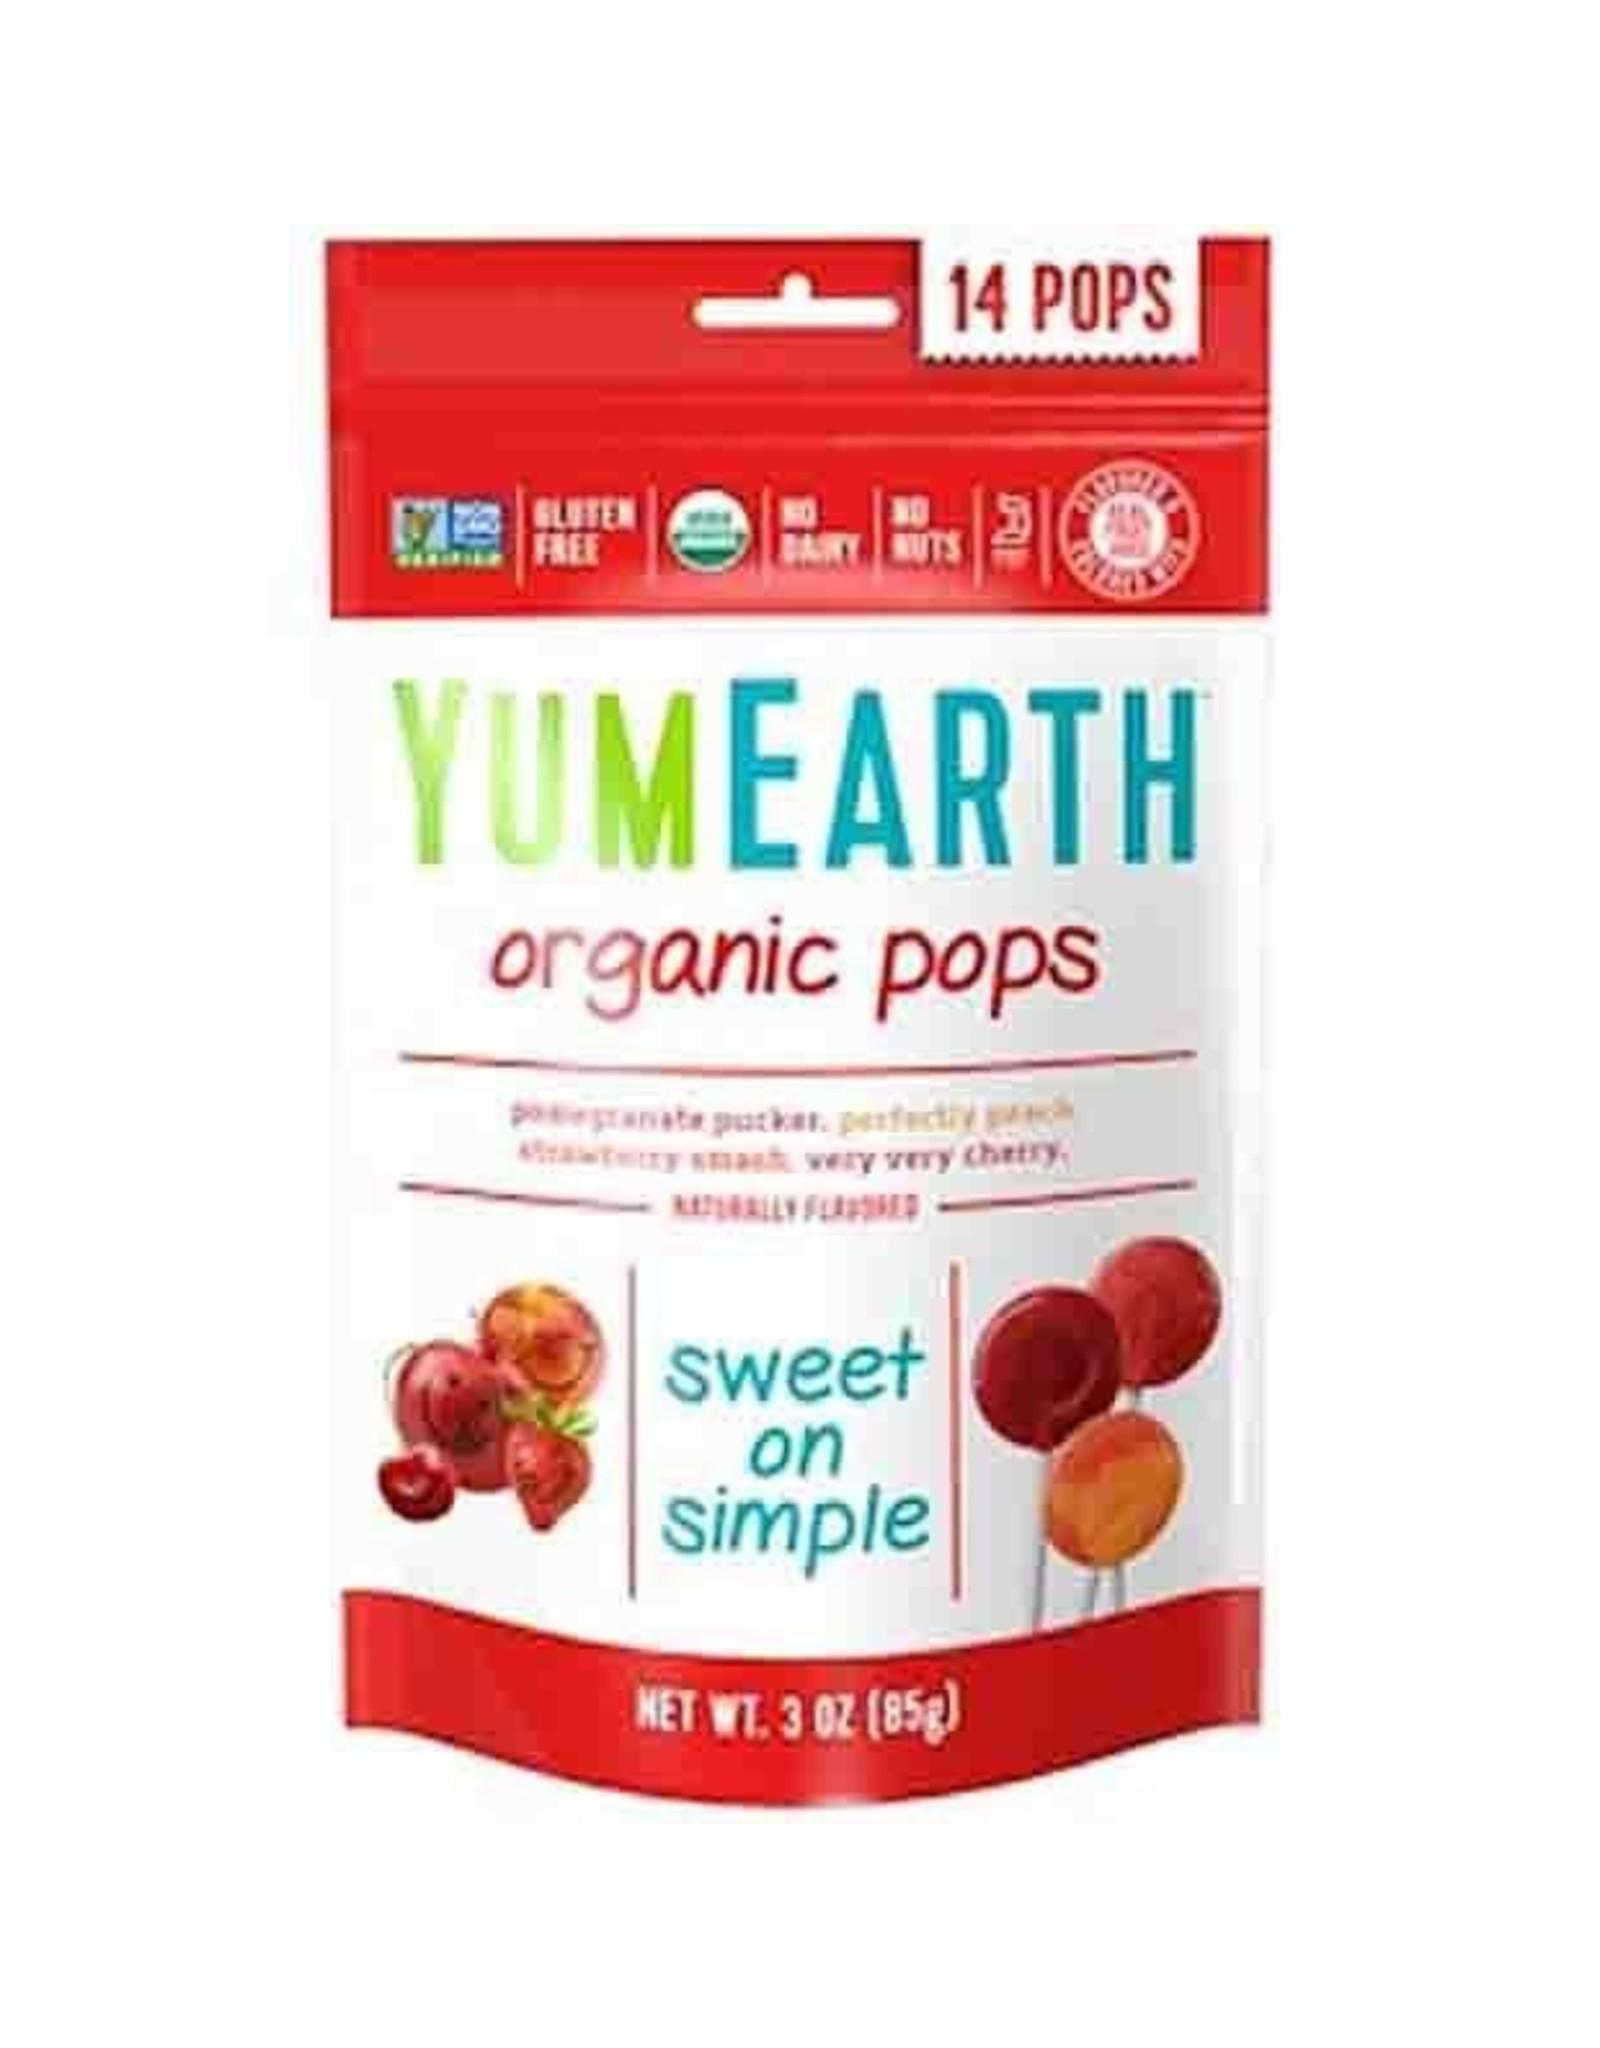 Yum Earth Organic Pops 87g